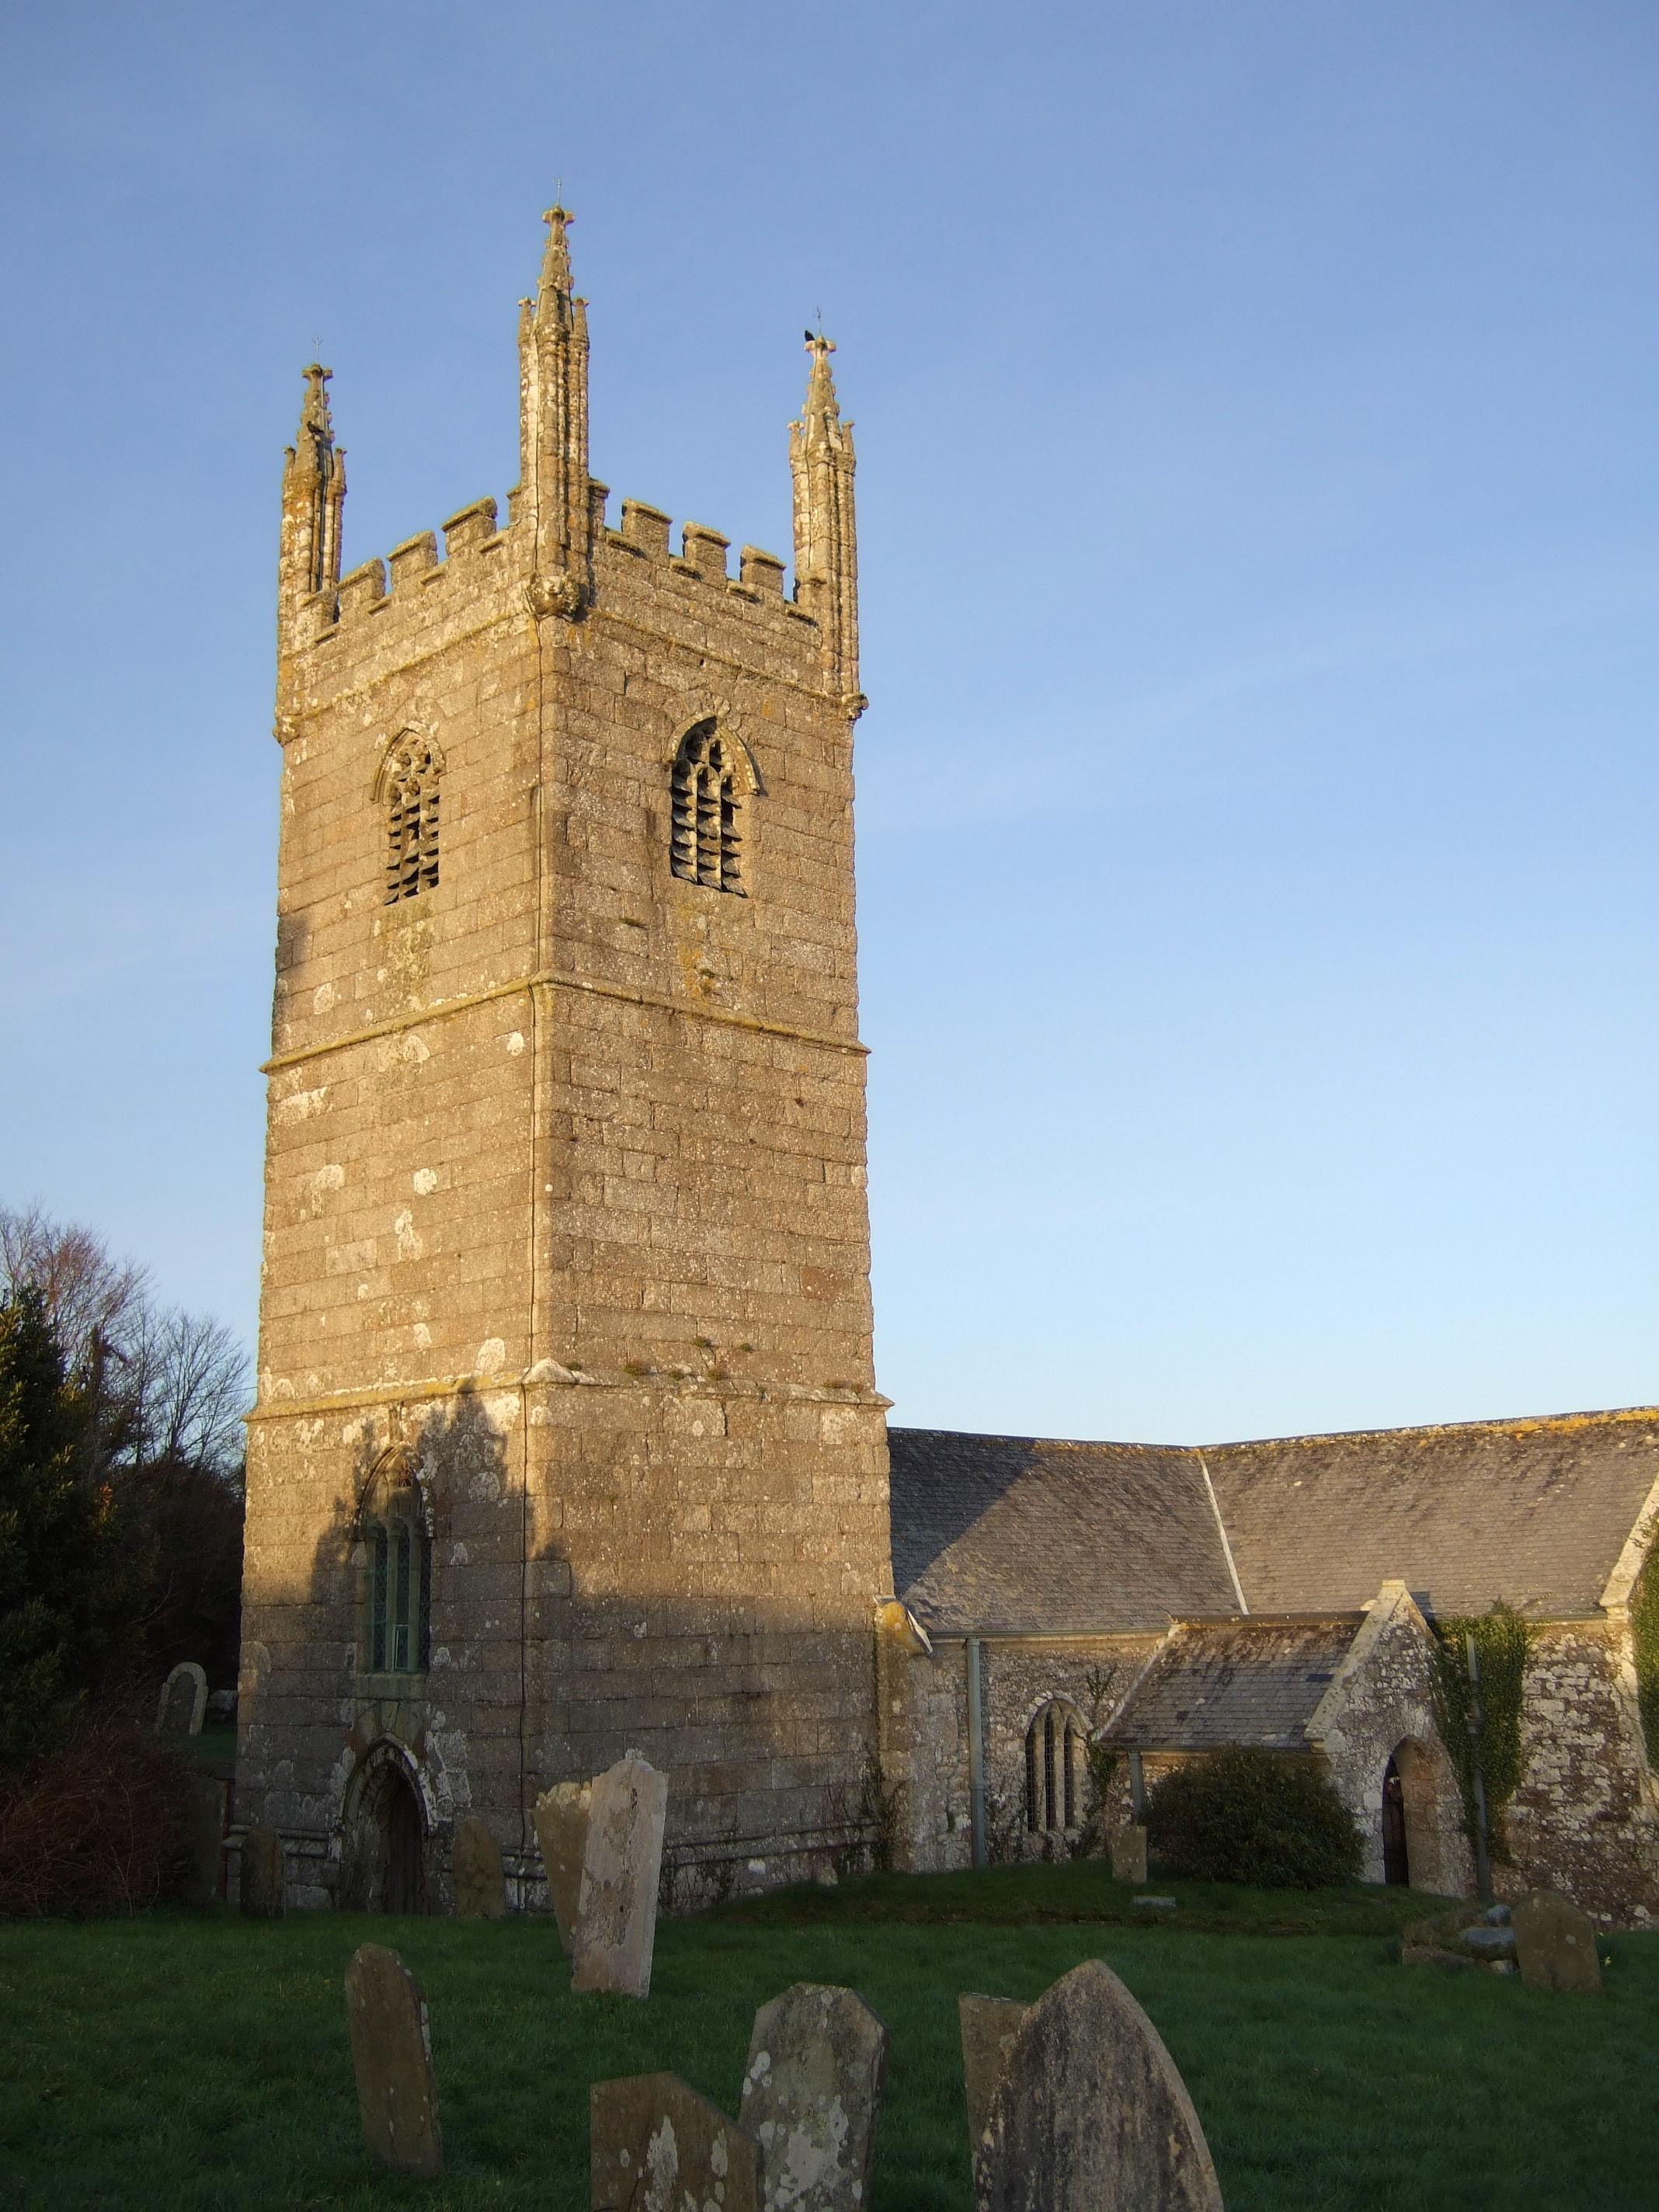 ST MAWGAN-IN-MENEAGE, St Mawgan-in-Meneage, Cornwall (c) Keltek Trust